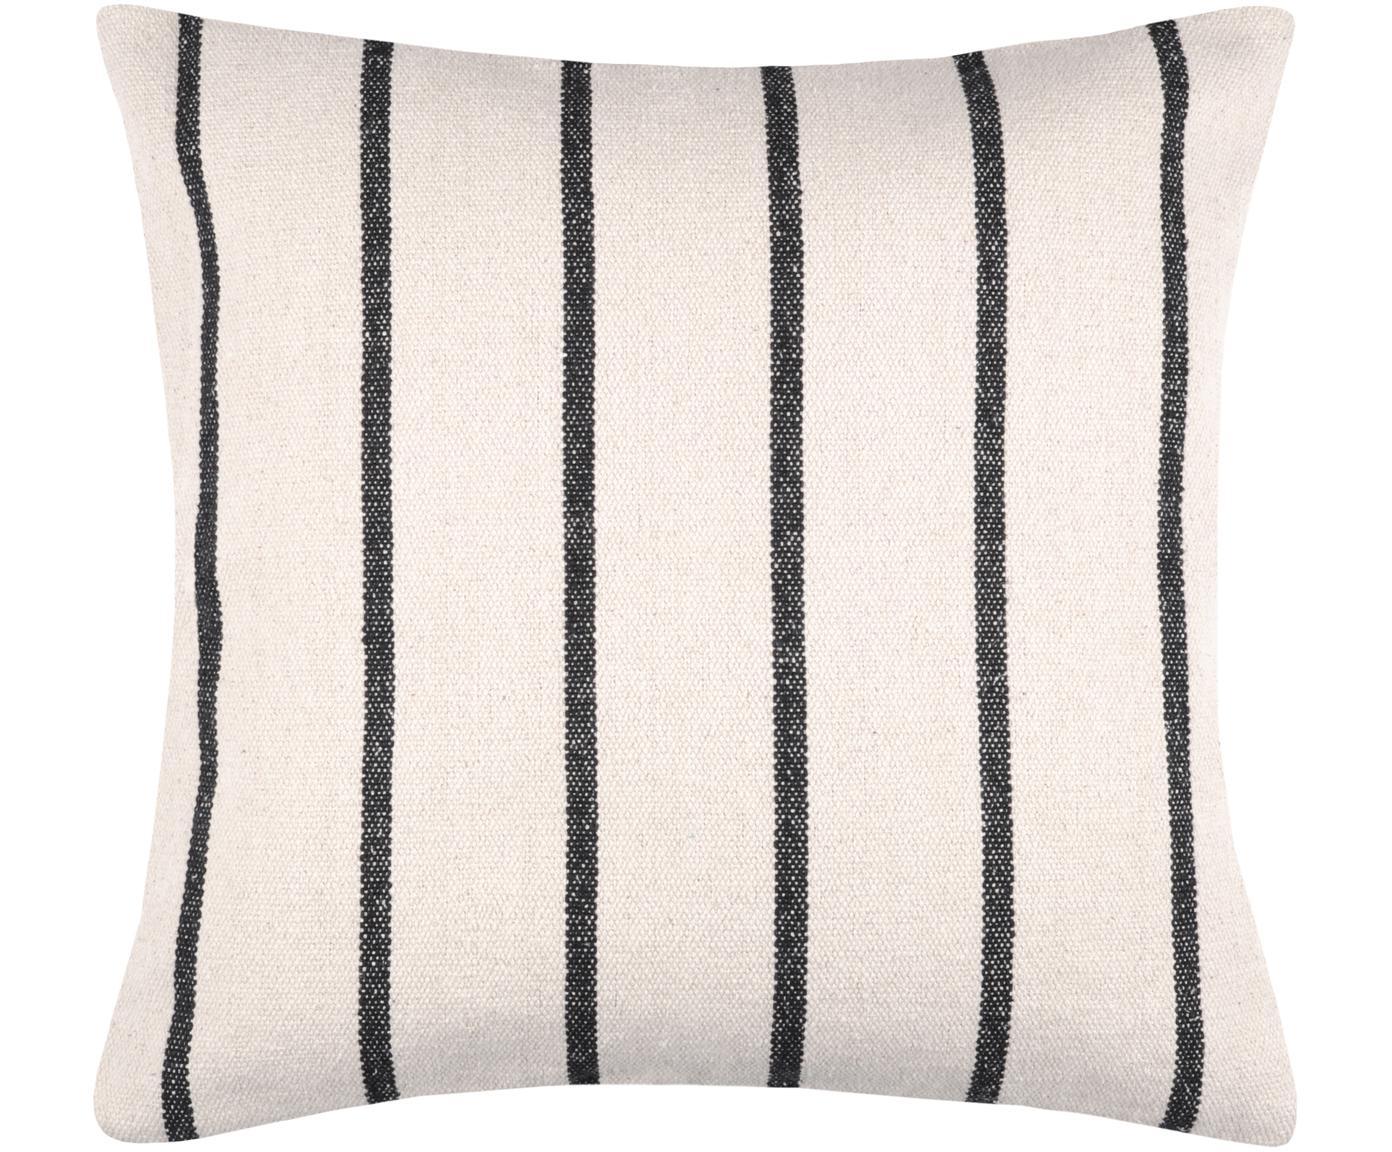 Cuscino con imbottitura St Trop, Rivestimento: cotone, Nero, bianco, Larg. 50 x Lung. 50 cm